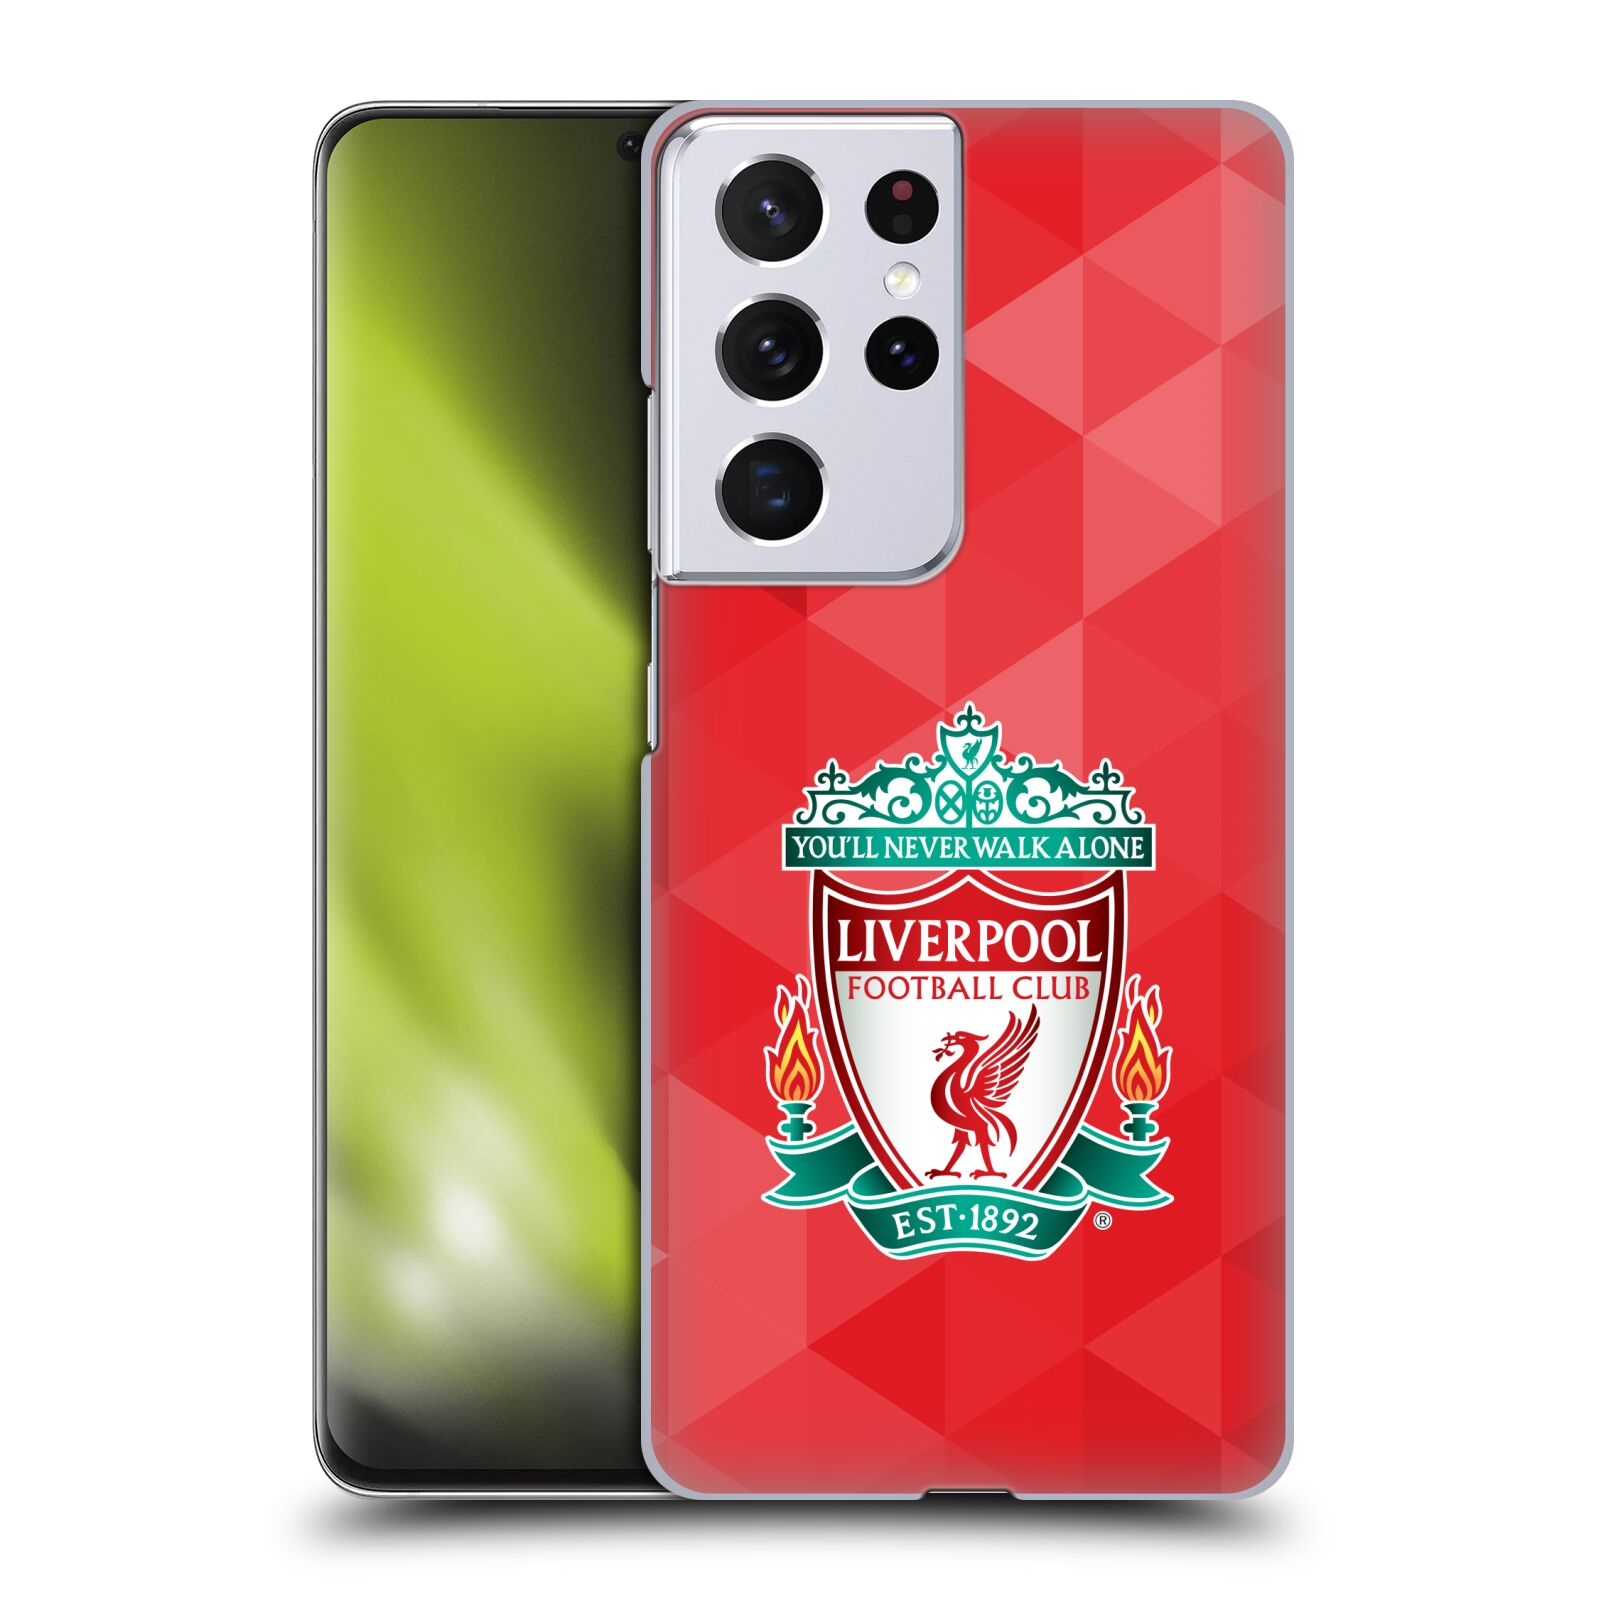 Plastové pouzdro na mobil Samsung Galaxy S21 Ultra 5G - Head Case - ZNAK LIVERPOOL FC OFFICIAL GEOMETRIC RED